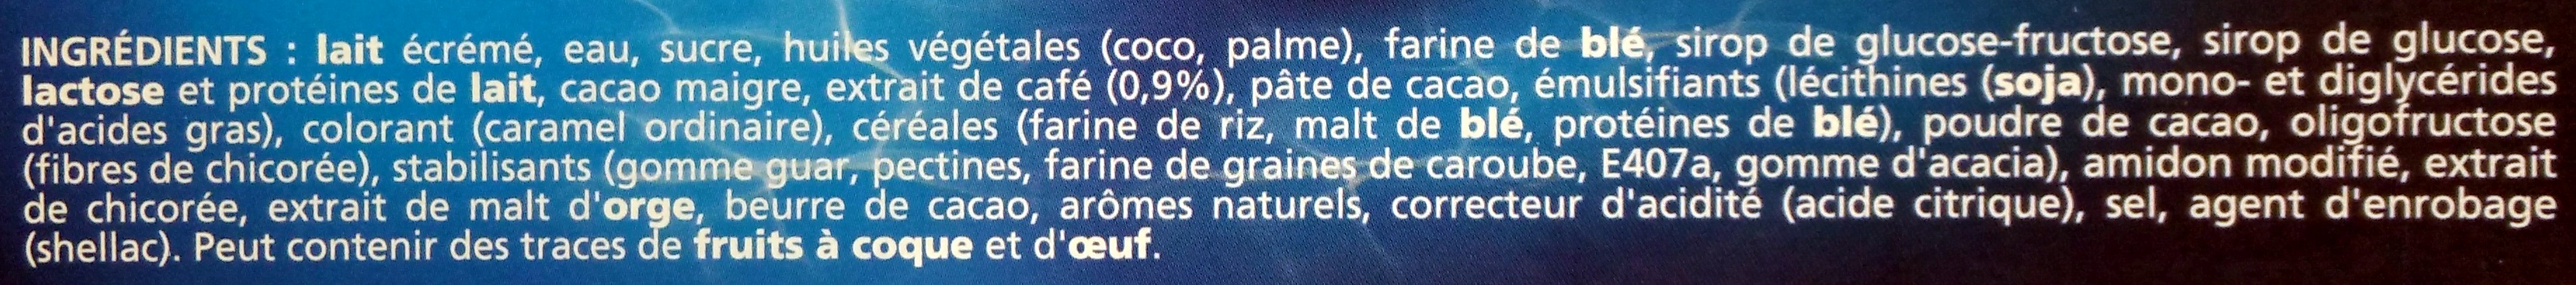 Extrême Café - Ingredients